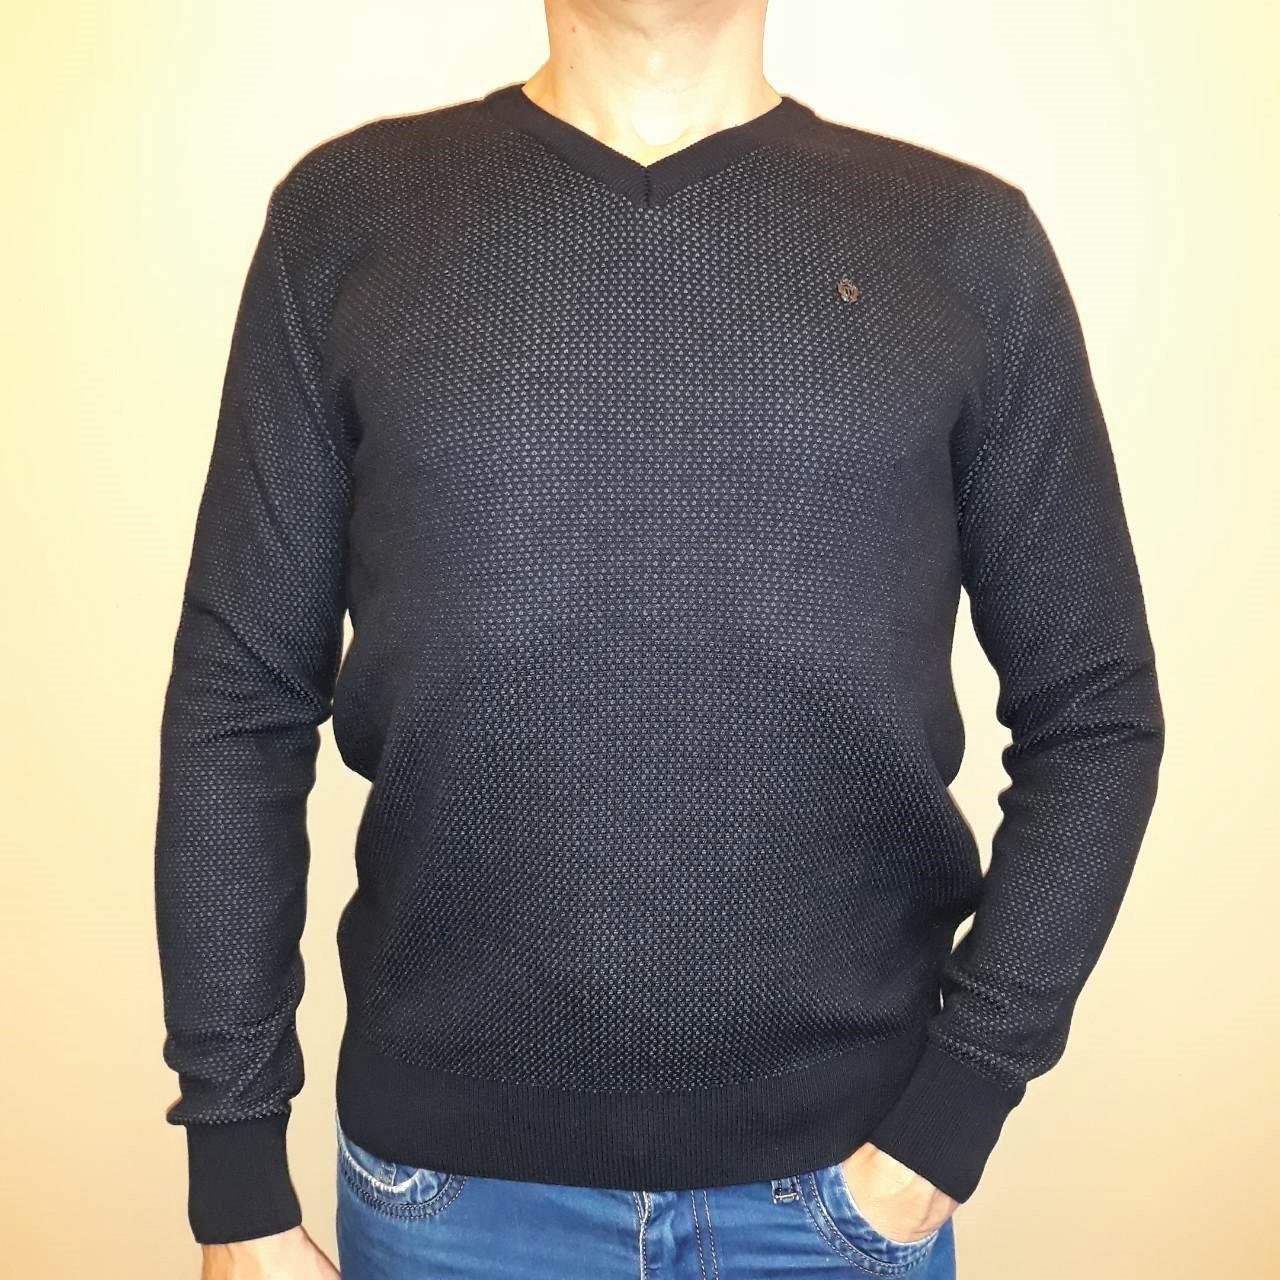 5f7fb7ff183 Пуловер мужской цвета индиго Tony Montana  продажа